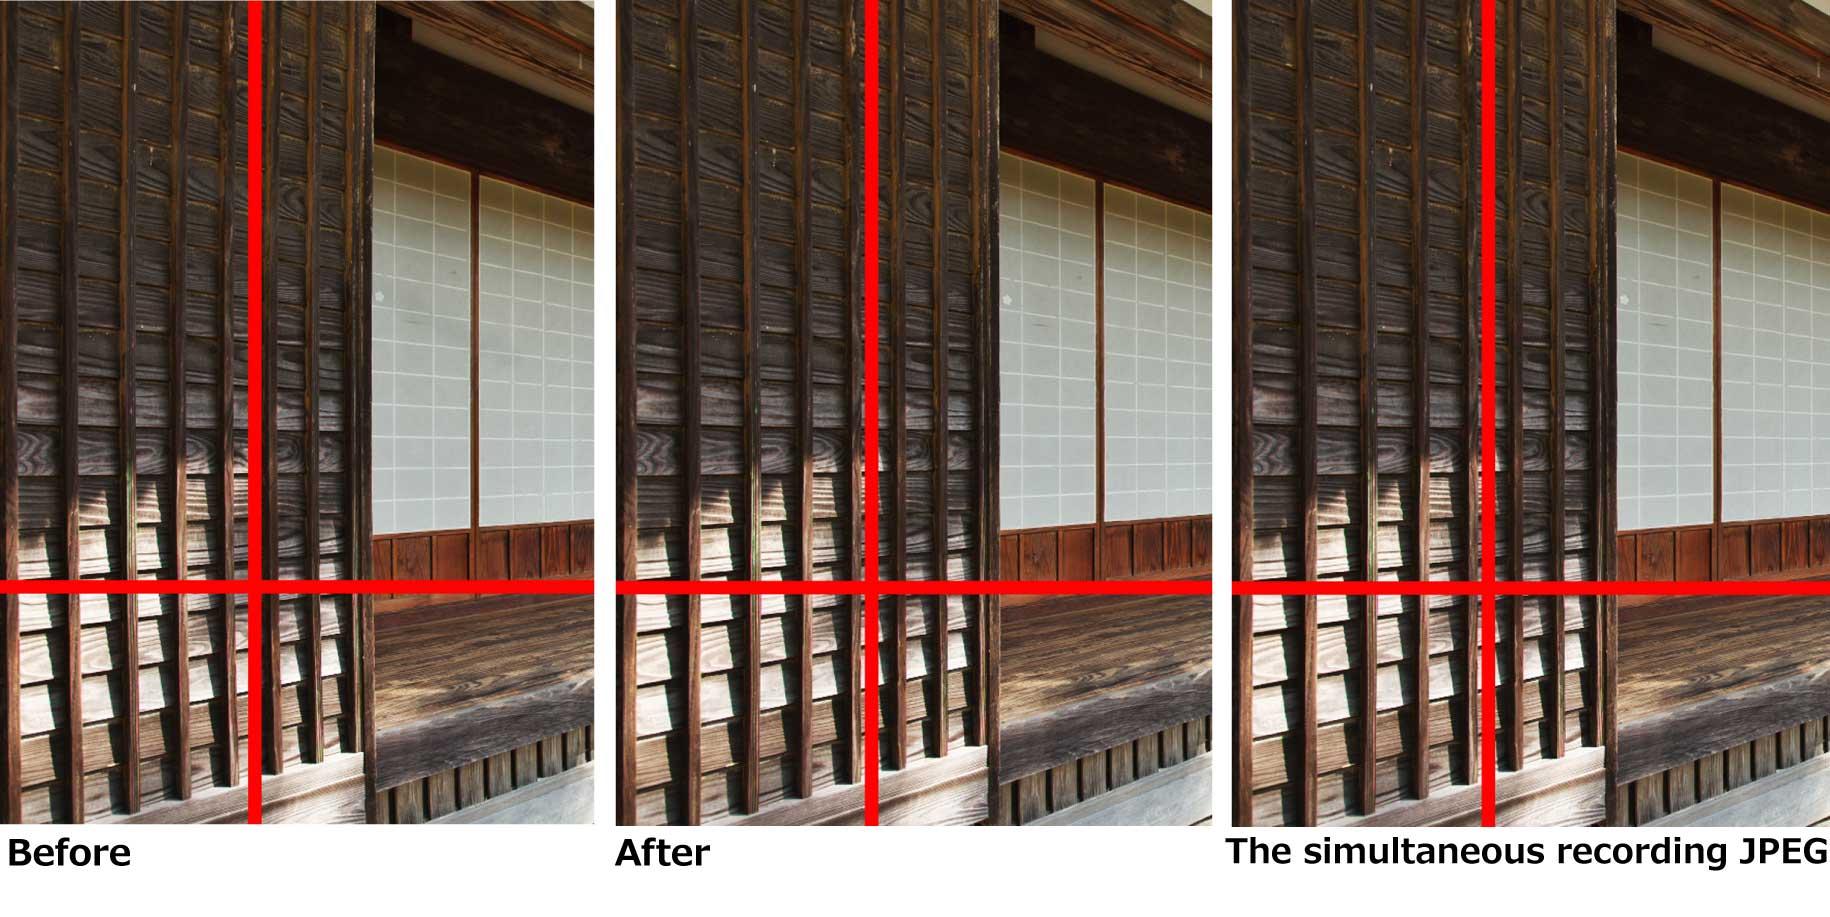 Automatic distortion correction using JPEG 1-2